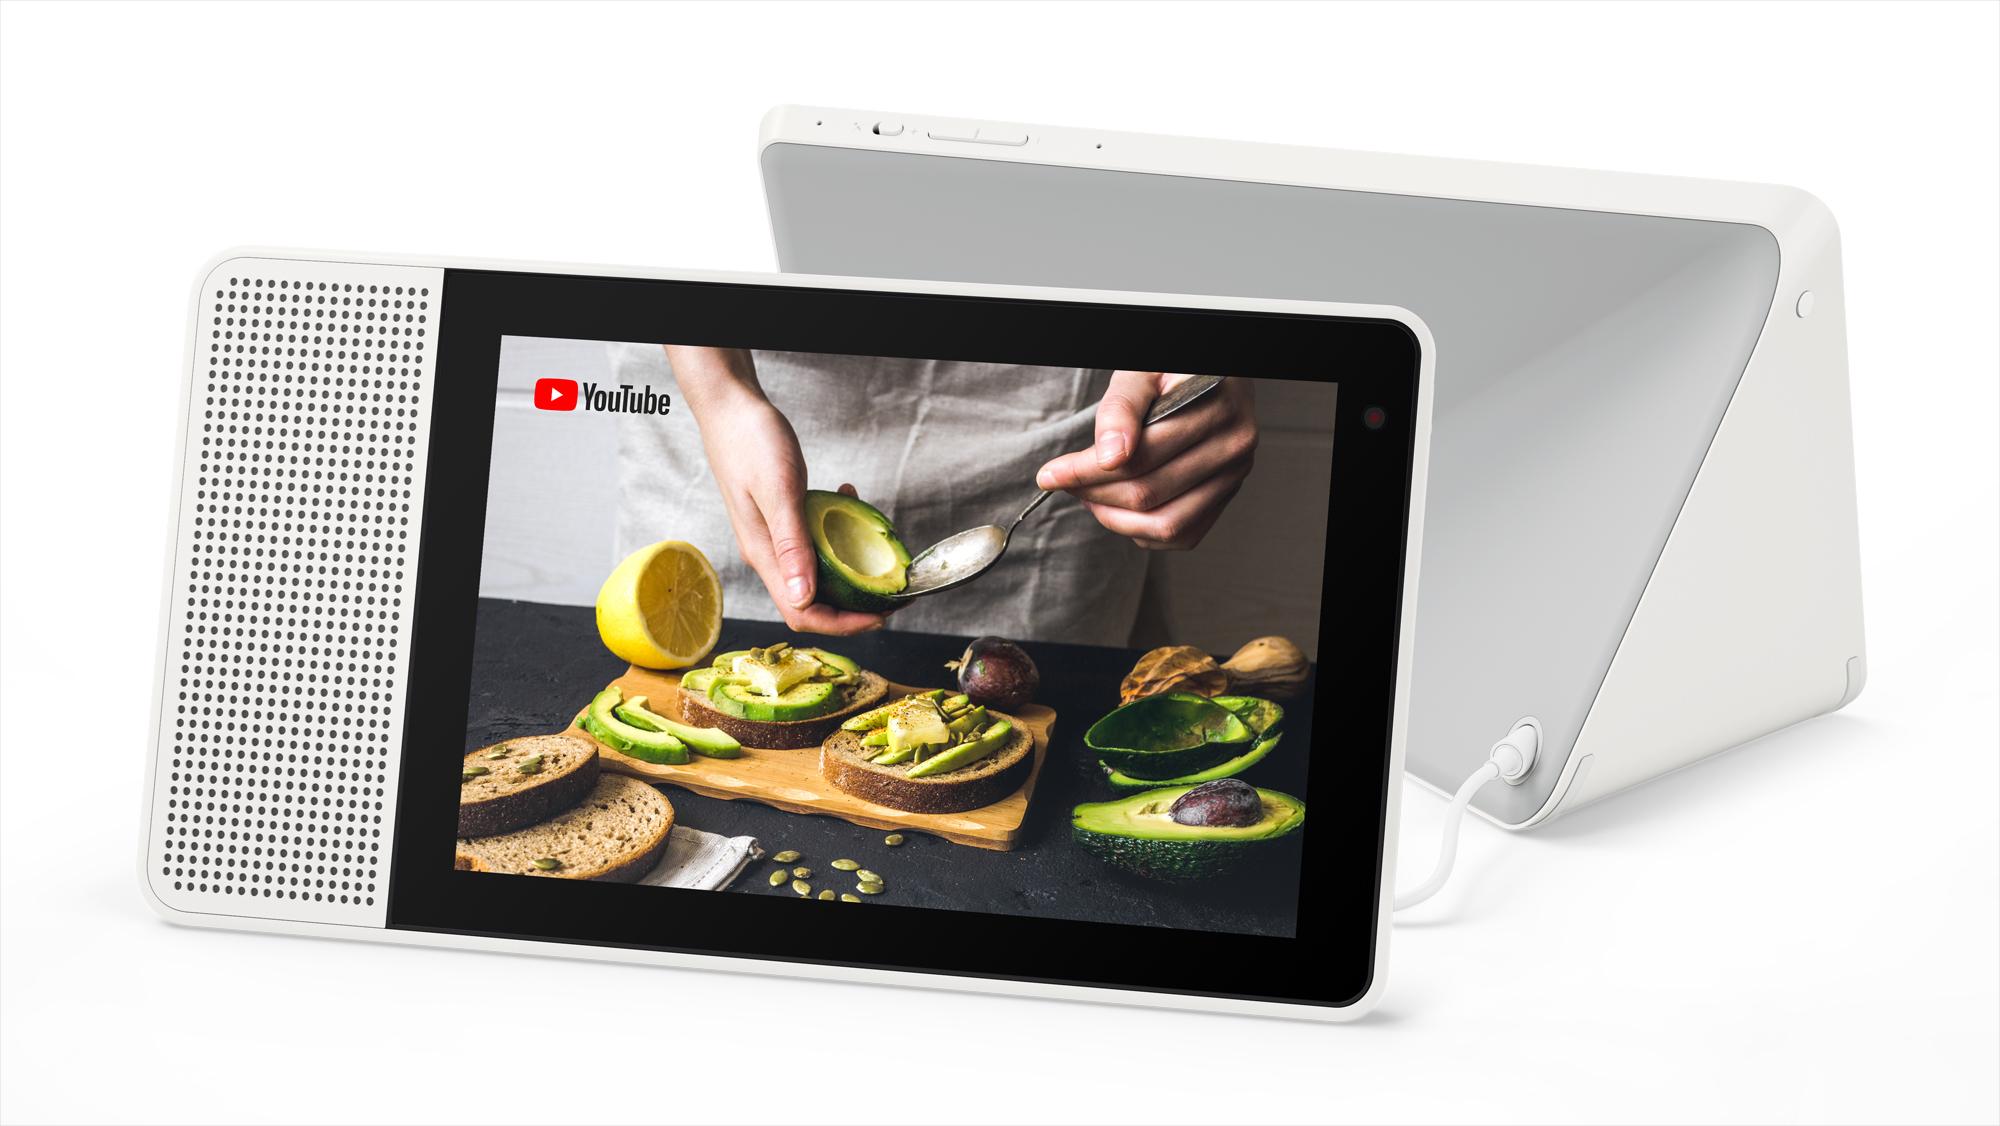 Lenovo 8 Inch Smart Display Walmart B&M $45